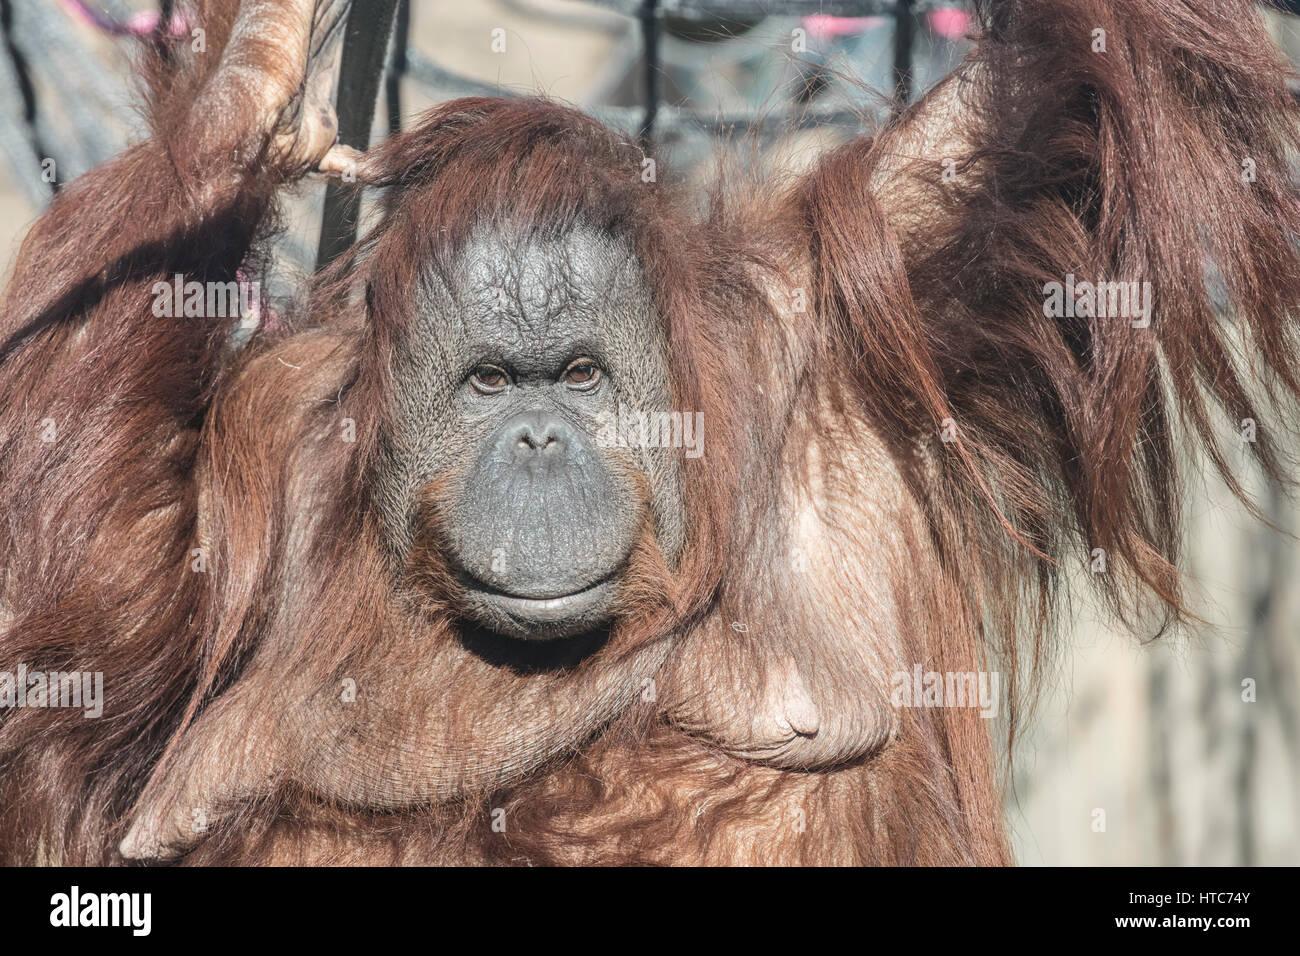 Orangutan, Tywcross Zoo, Leicestershire - Stock Image